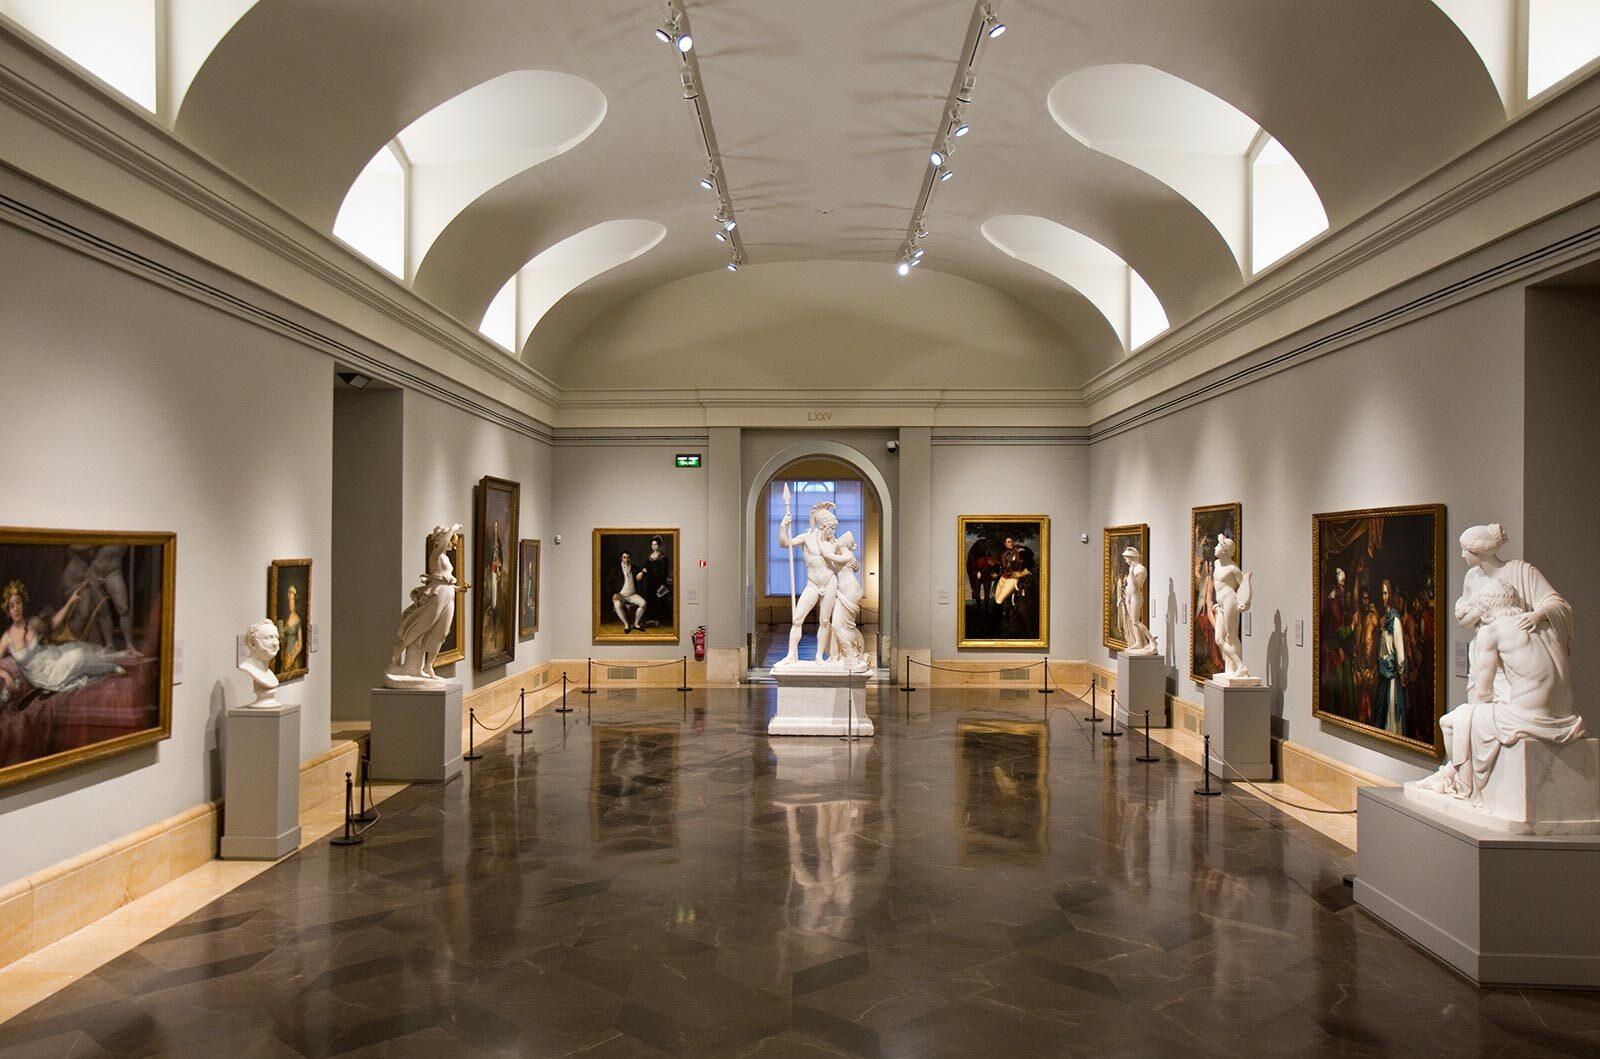 Prado-museet: Kunst i verdensklasse